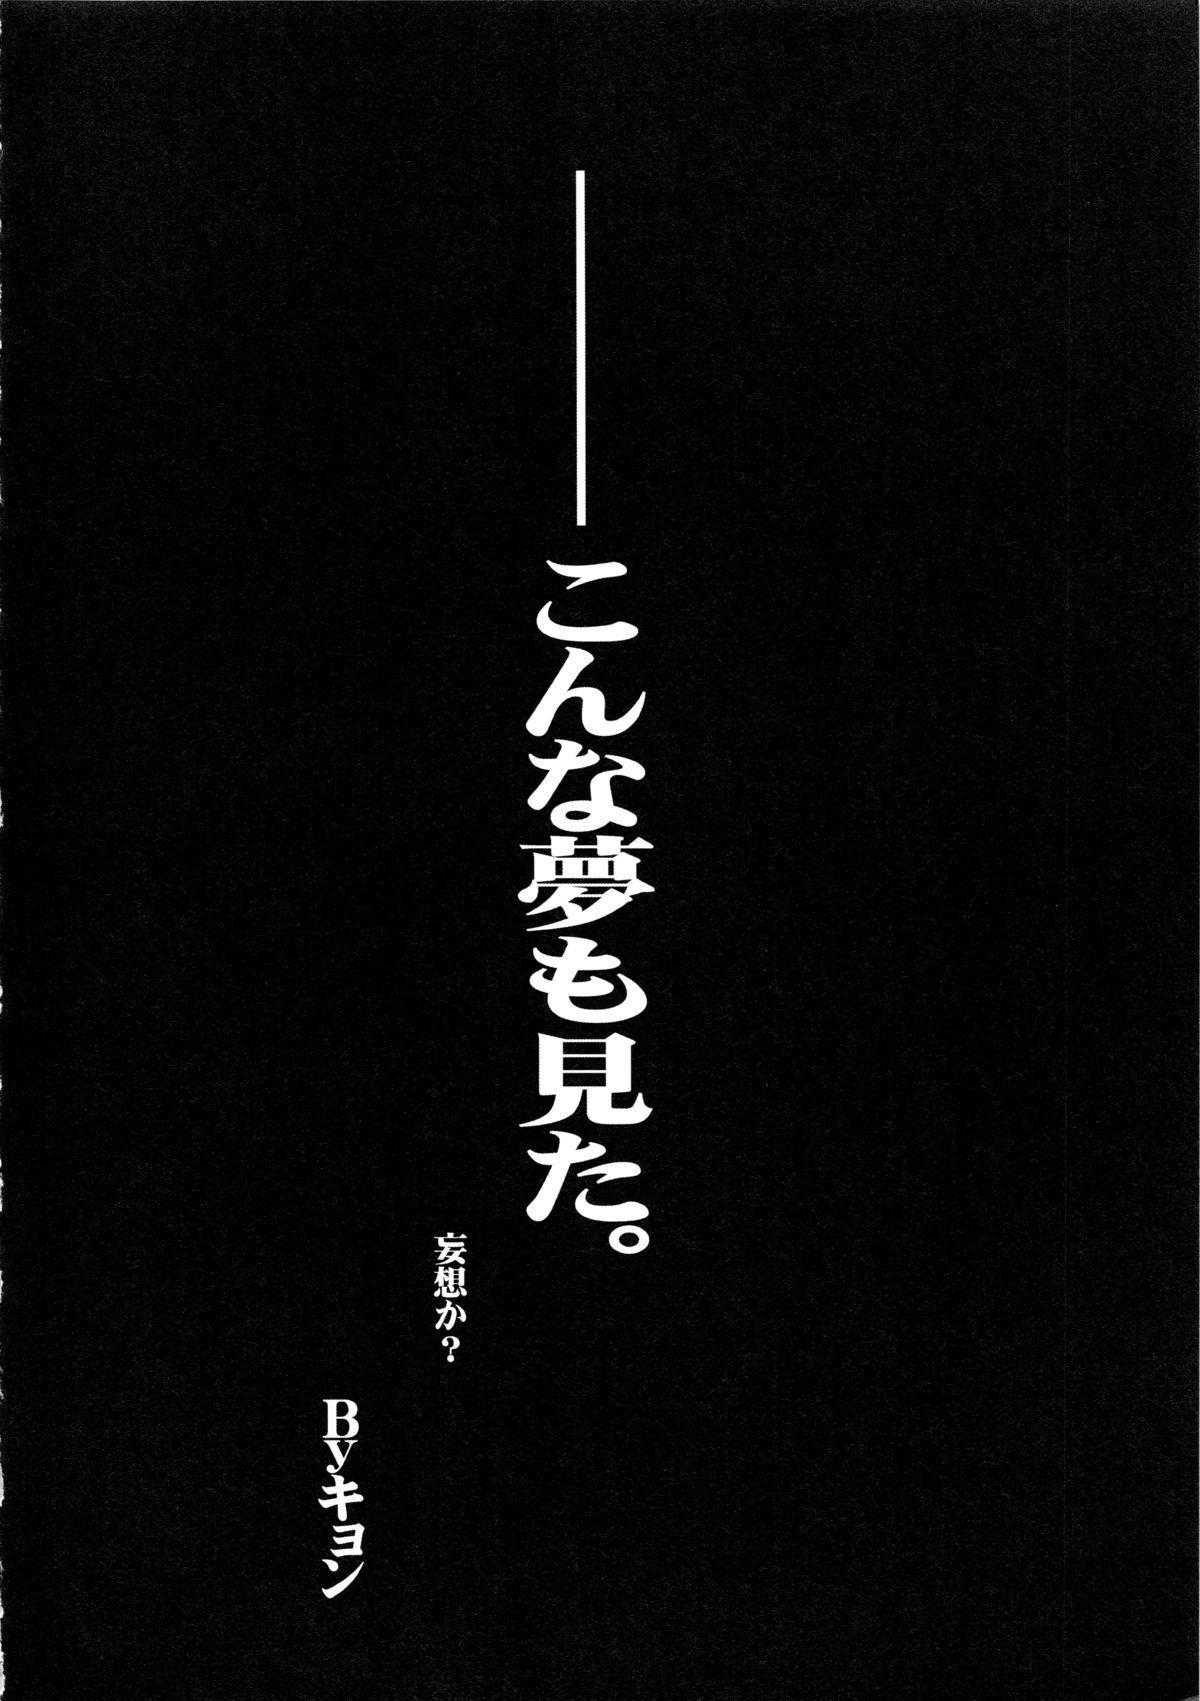 School-mer! School Mizugi Bloomer Joshi Anthology 18